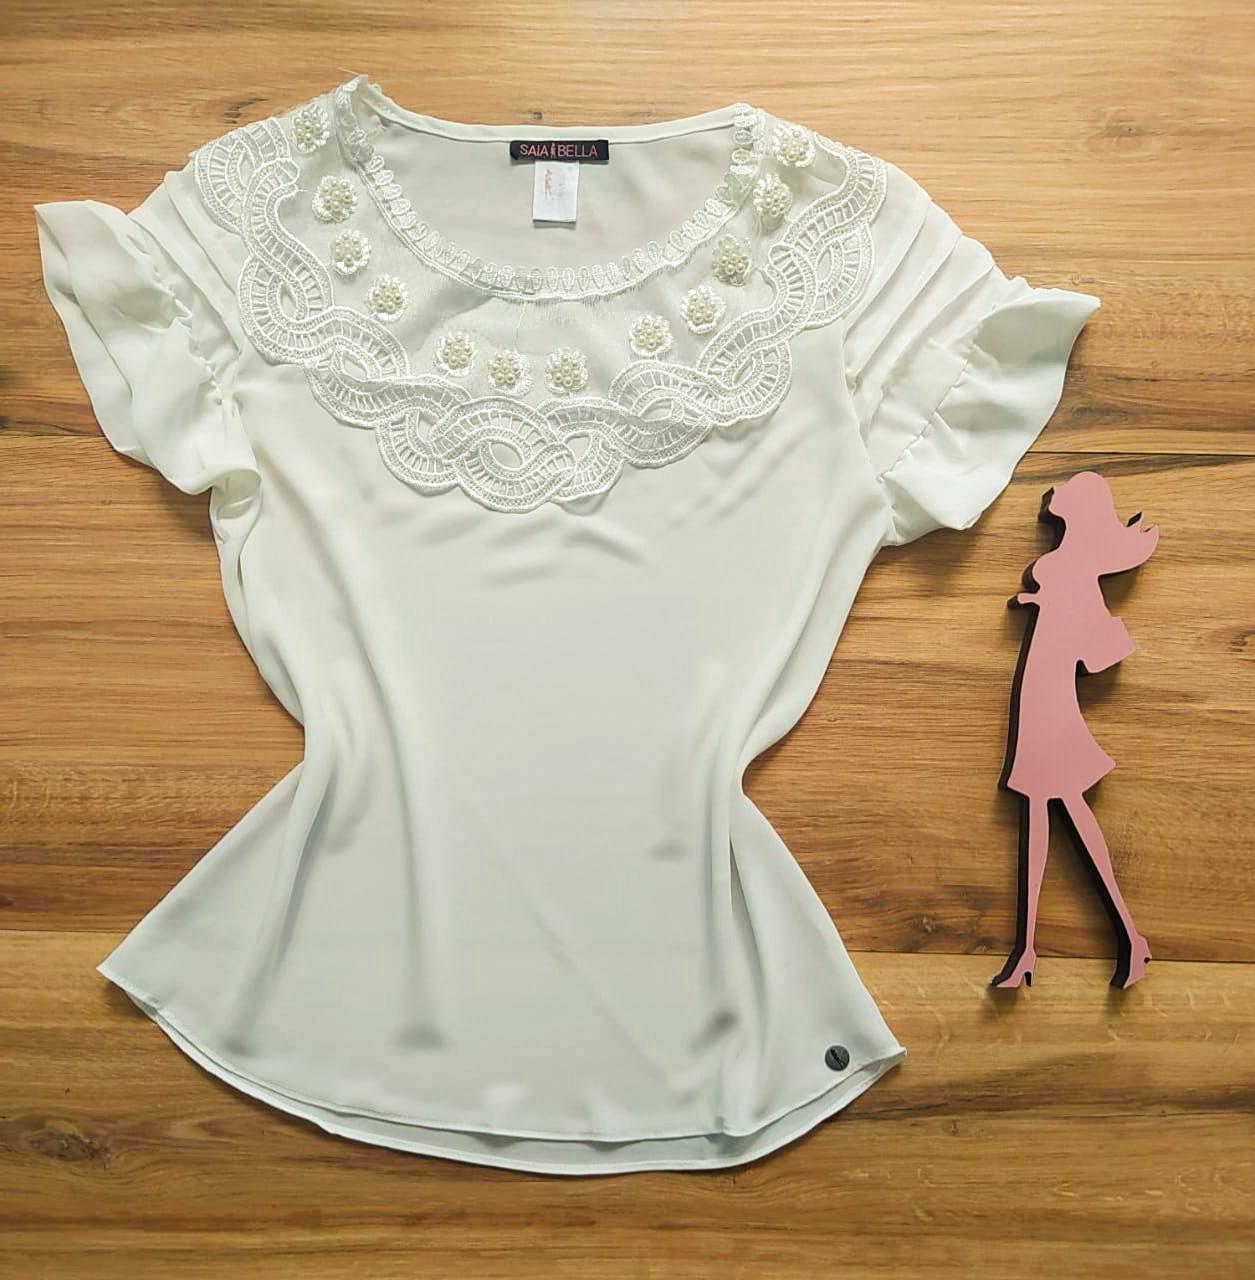 Blusa Shirley Saia Bella - SB80005 Branco